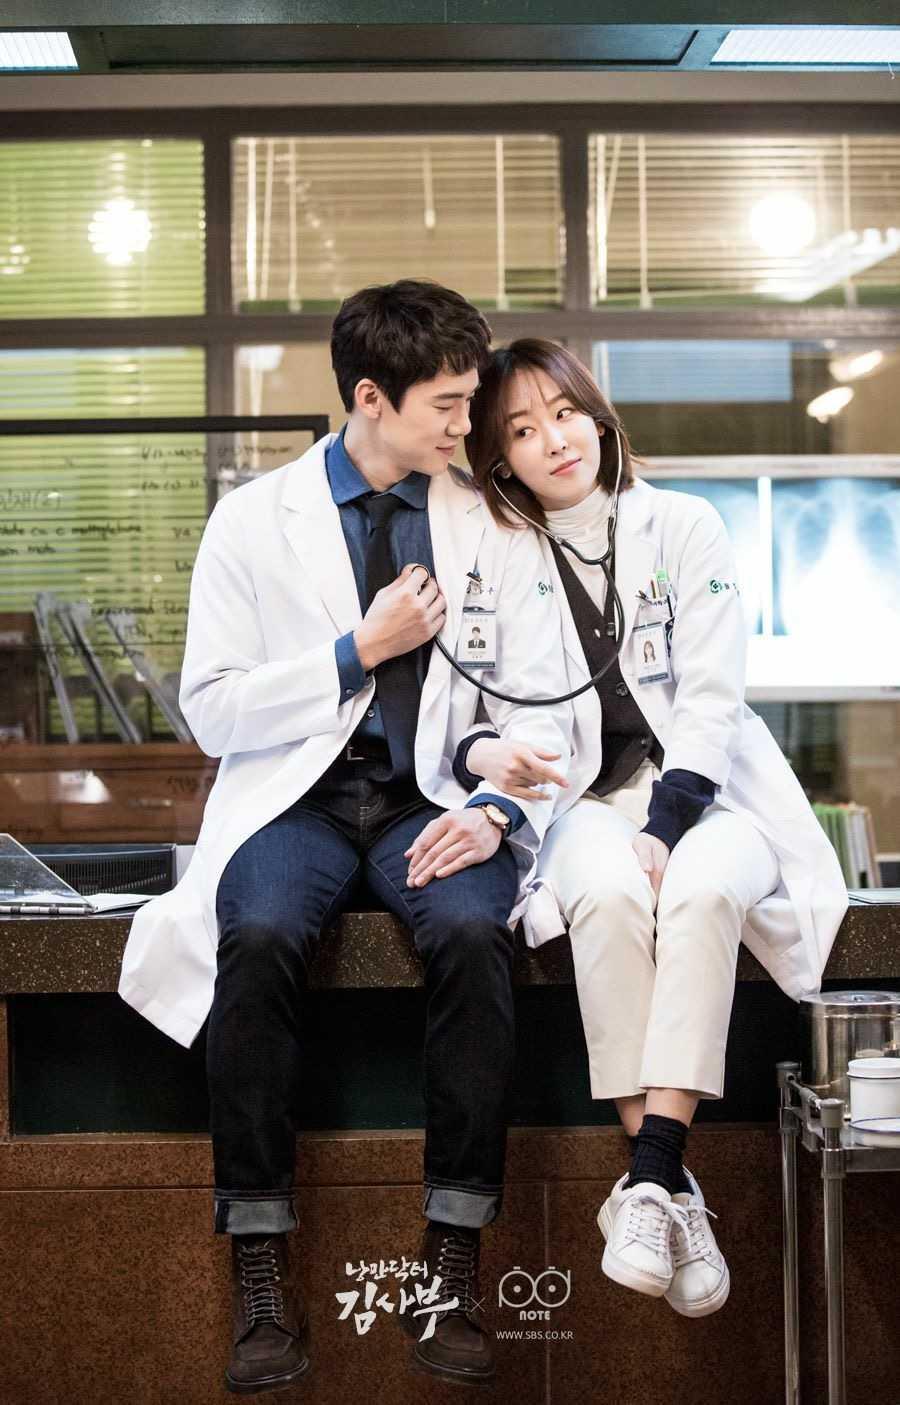 romantic-doctor-teacher-kim-ซับไทย-ตอนที่-1-21-ตอนพิเศษ-จบ-